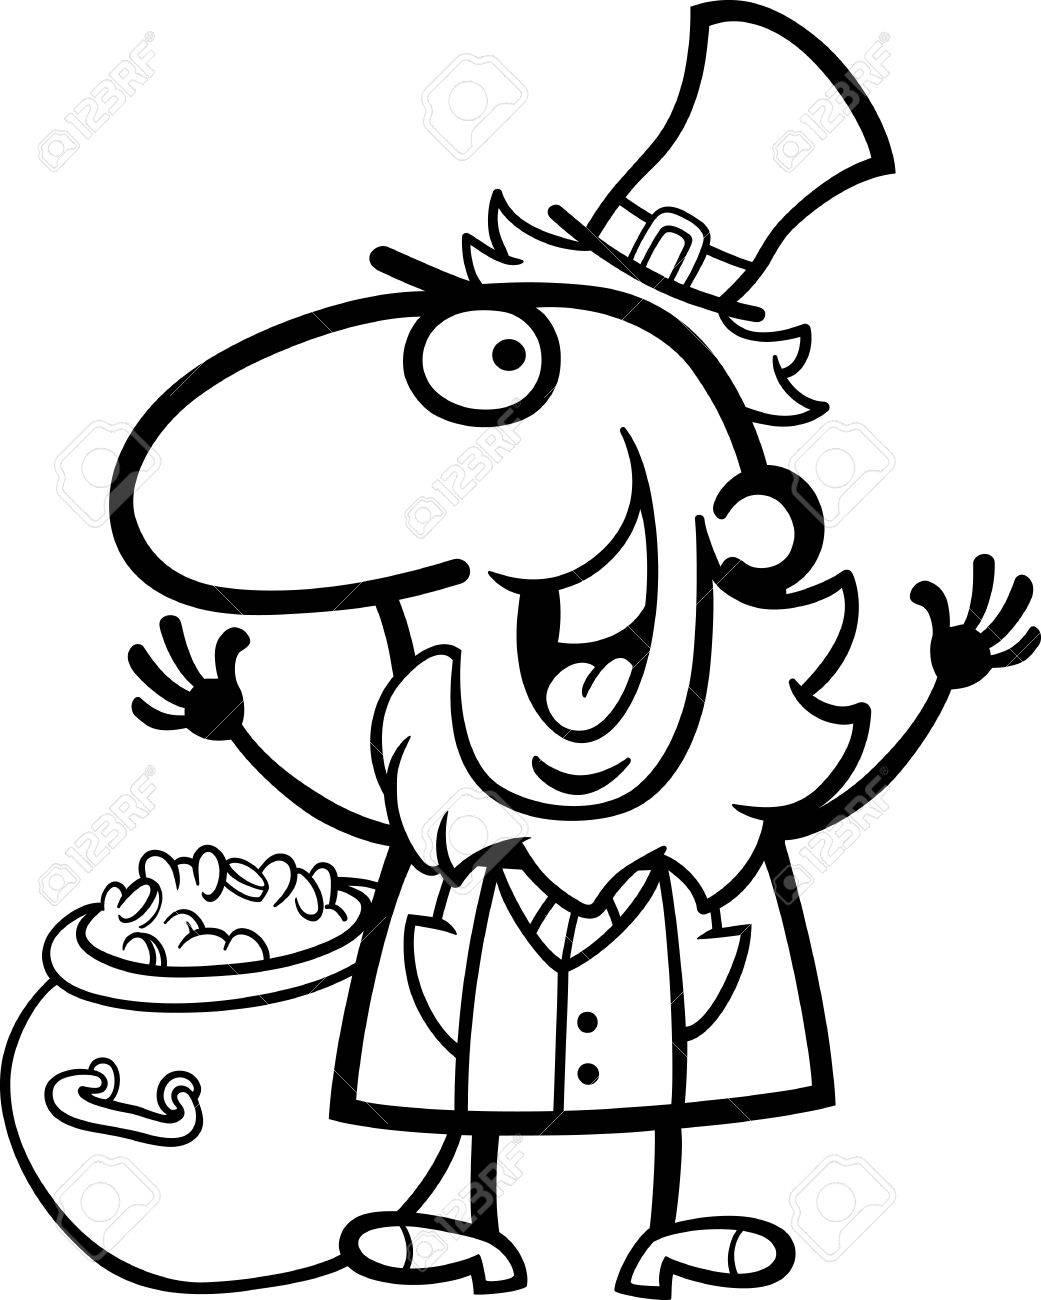 black and white cartoon illustration of happy leprechaun with